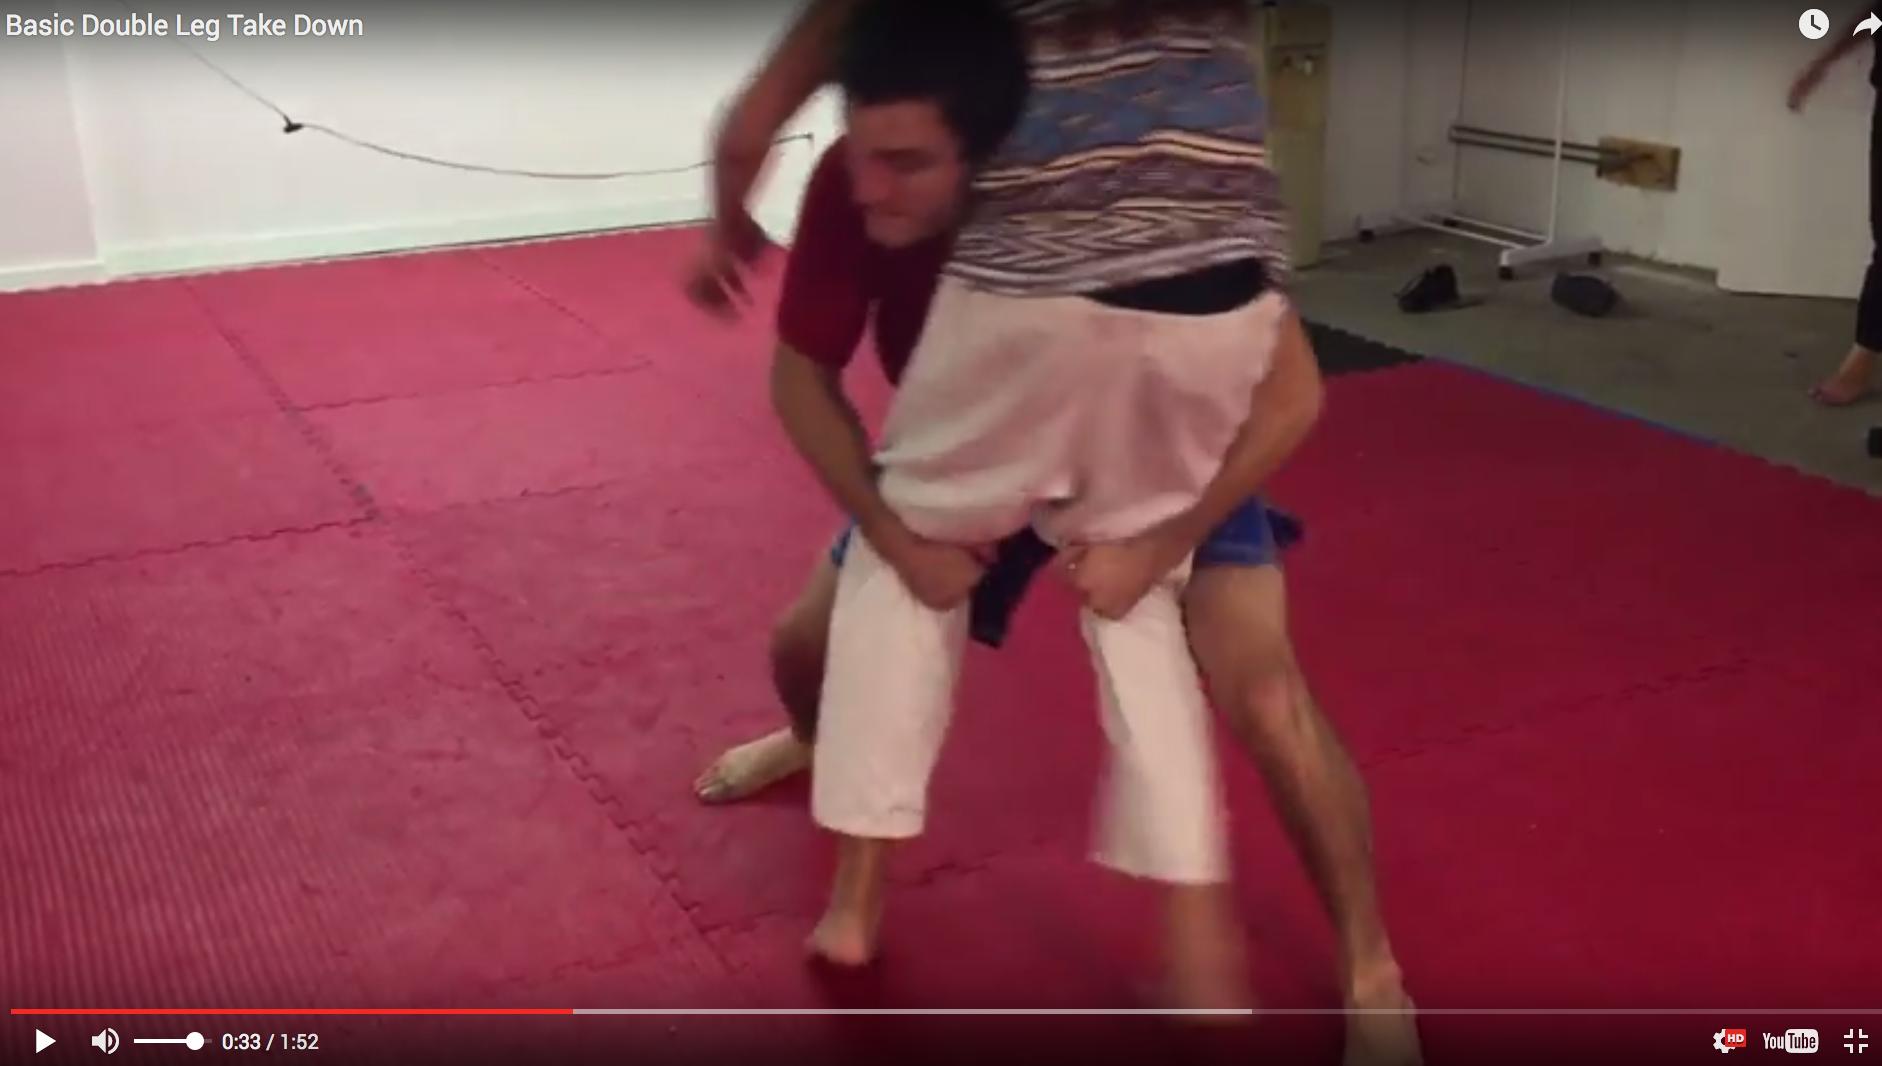 Basic Double Leg Wrestling Take Down